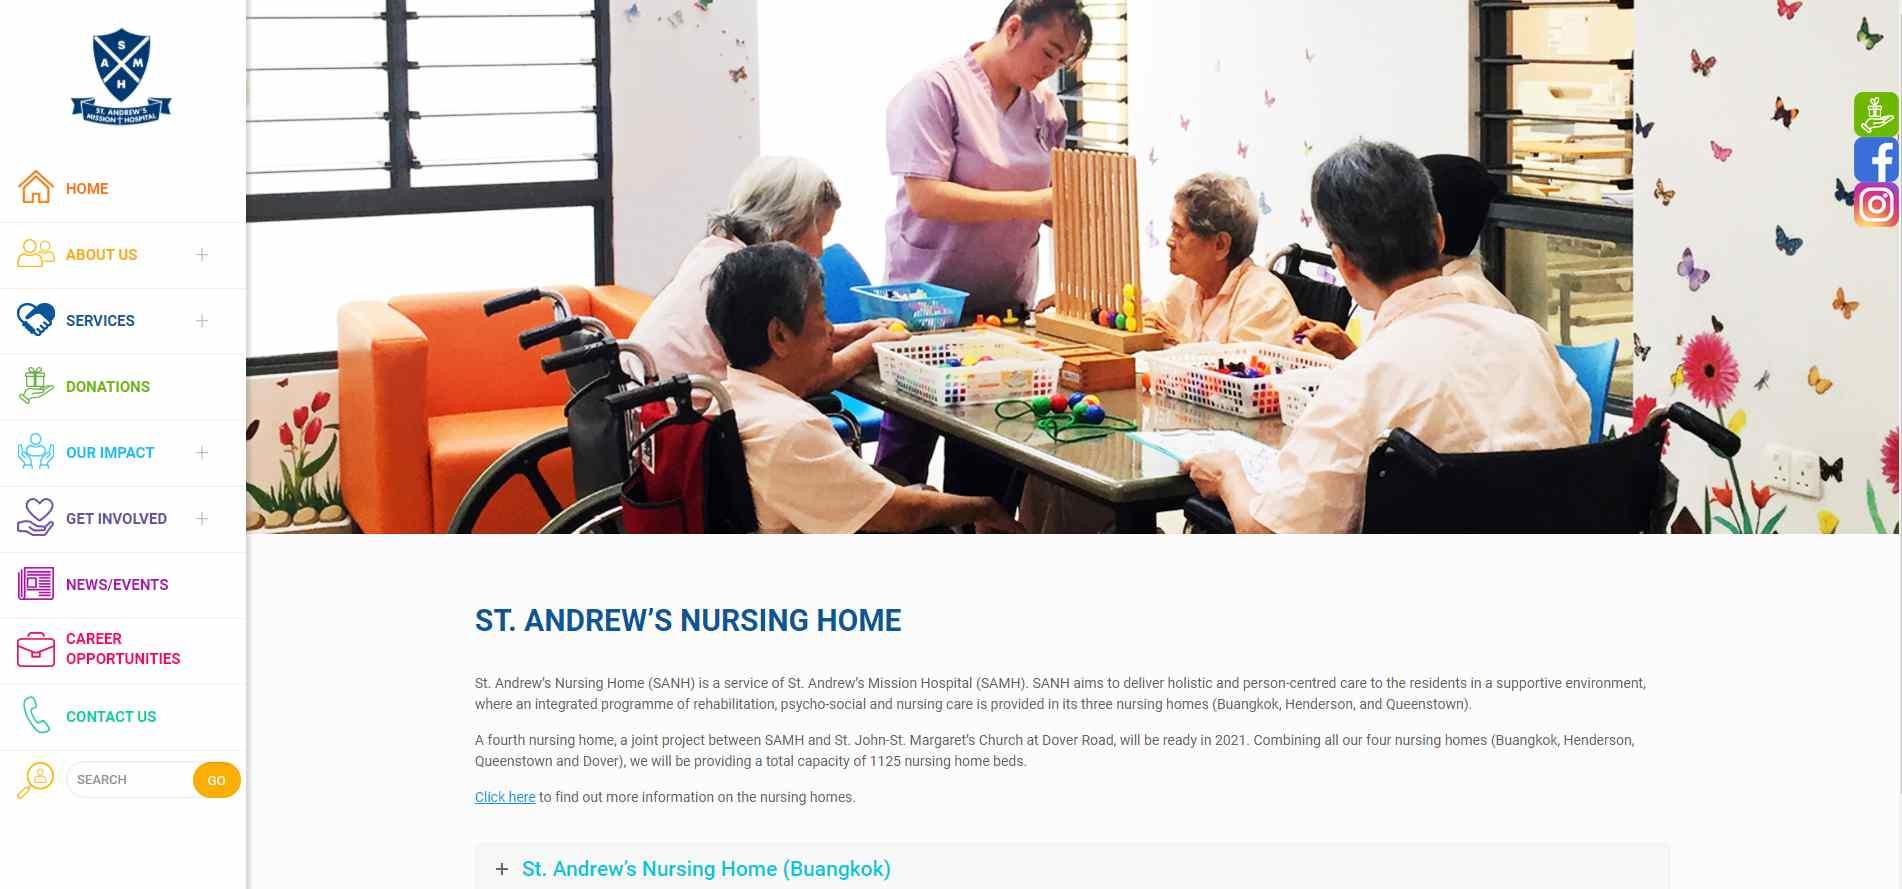 St. Andrews Top Nursing Homes in Singapore